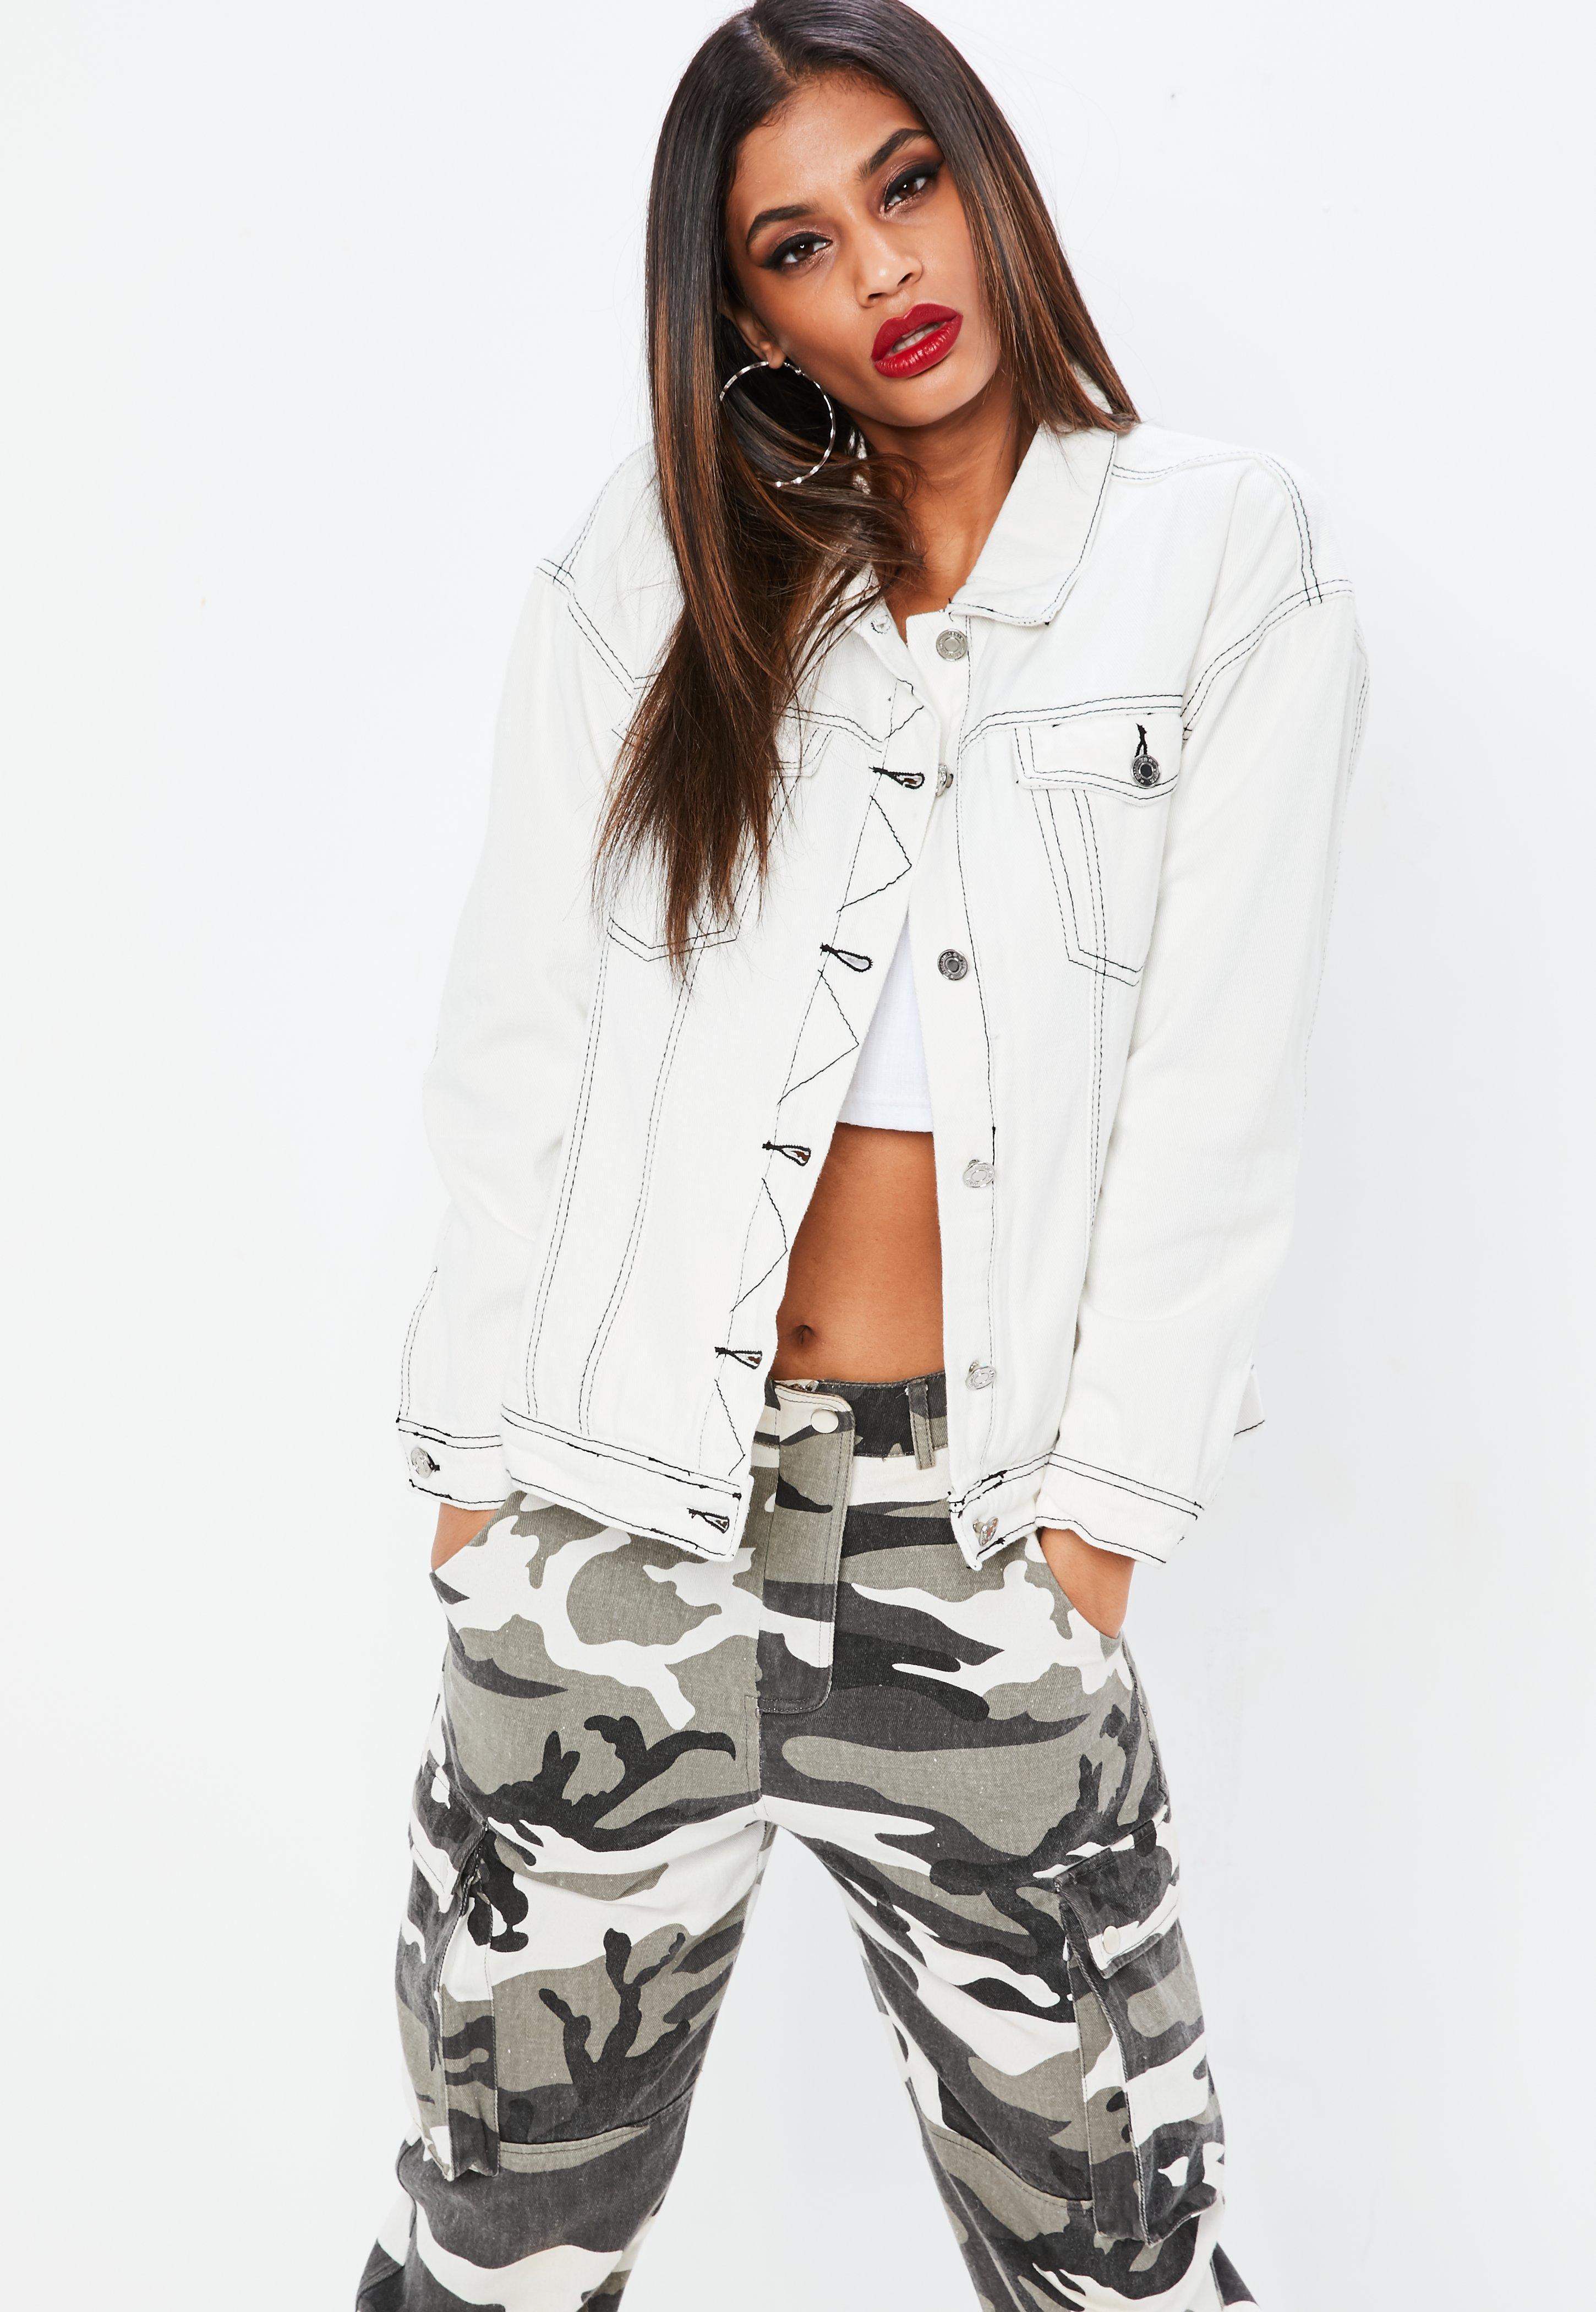 2b0bfddf2c2f4 Missguided White Contrast Stitch Denim Jacket in White - Lyst